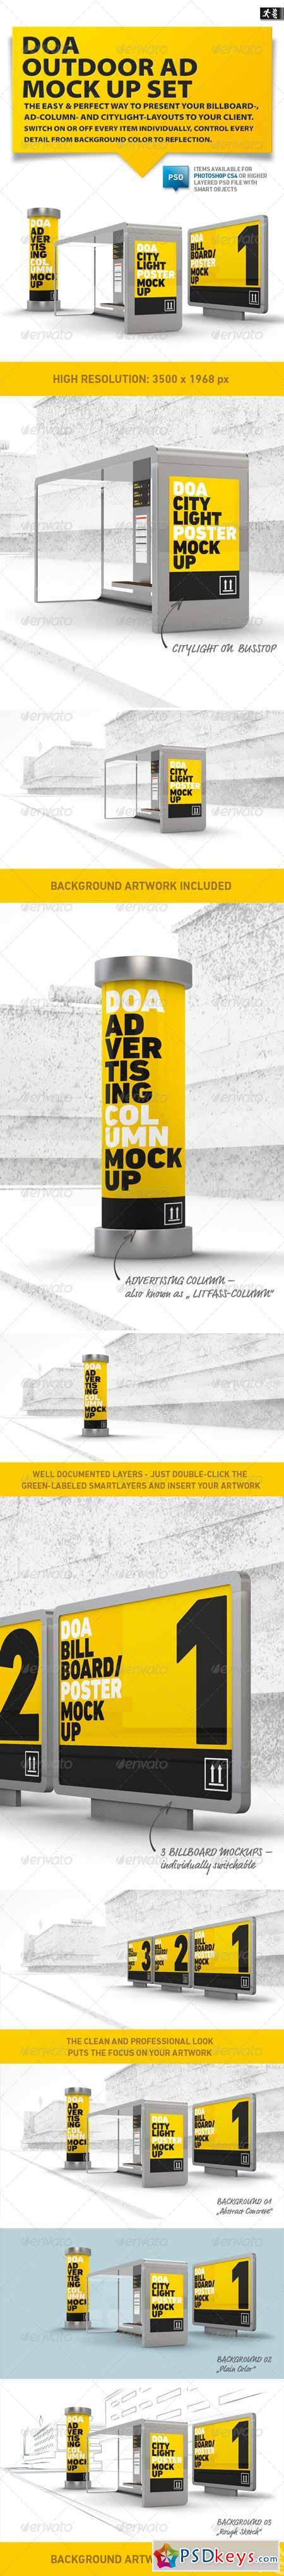 DOA Outdoor Mock Up Set 5012064 » Free Download Photoshop Vector